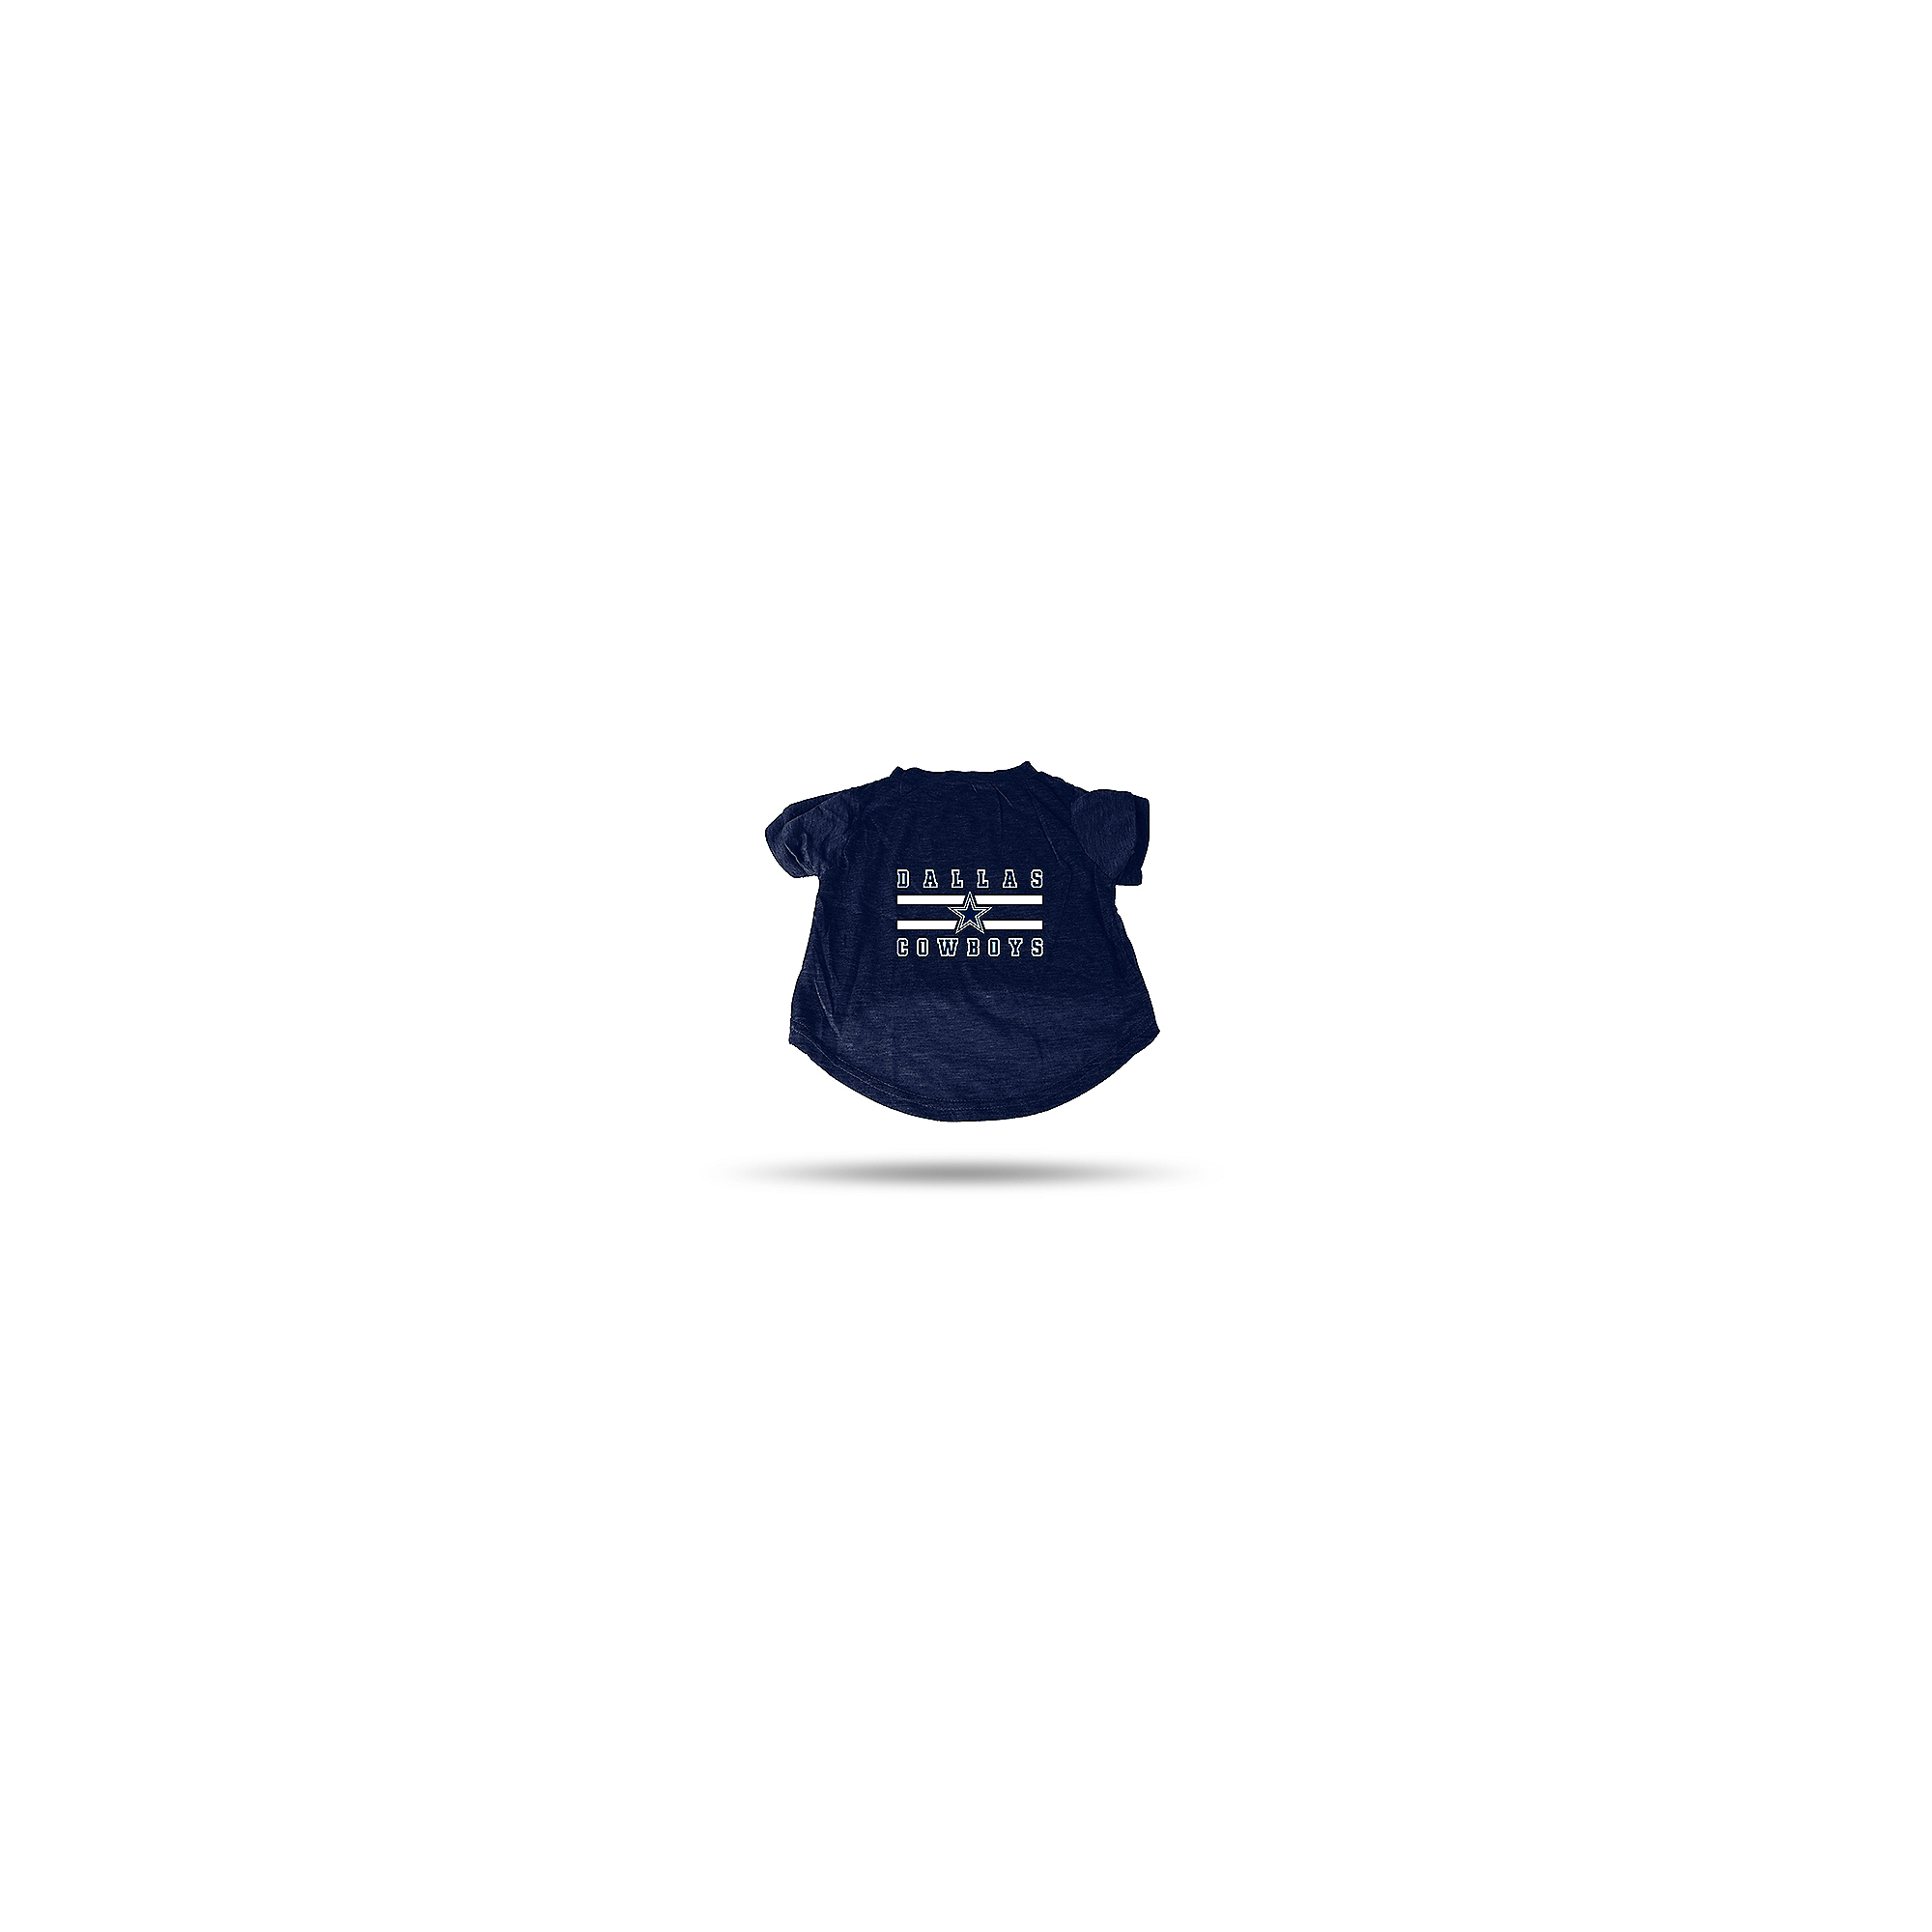 Dallas Cowboys Pet Shirt - Large  3ac58f4ae